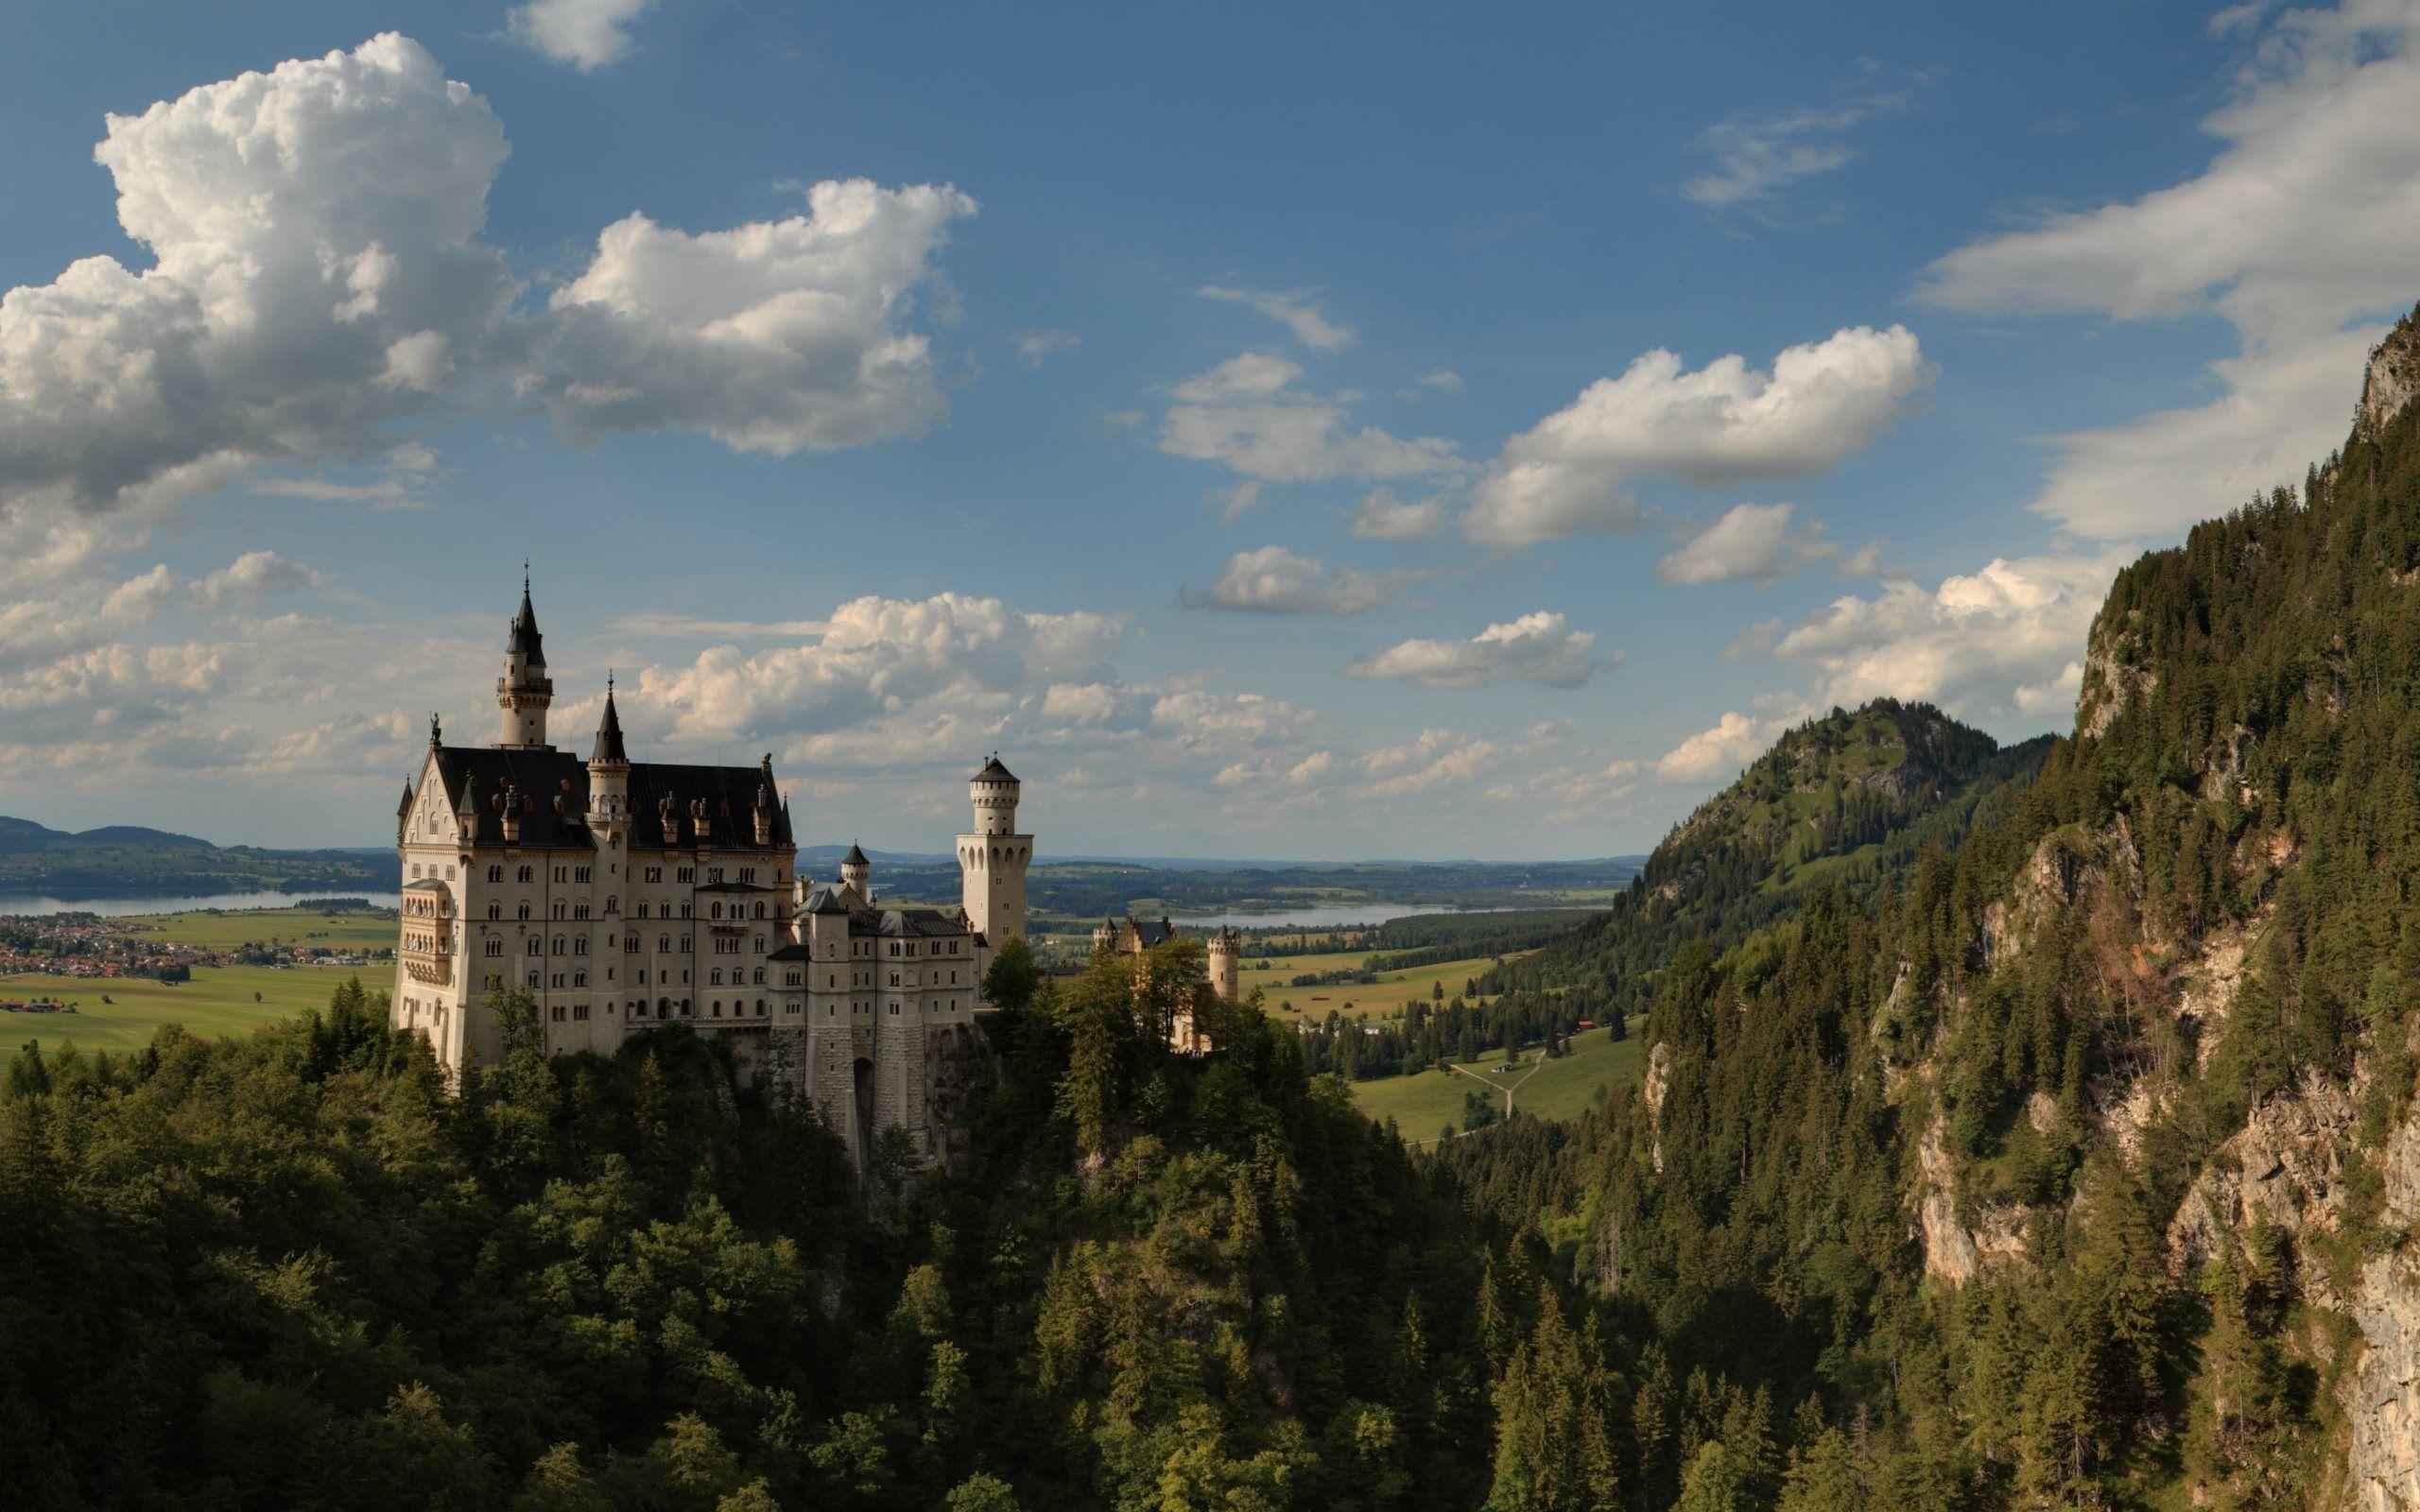 Neuschwanstein+castle+Schwangau%2C+Germany.jpg (2560×1600)